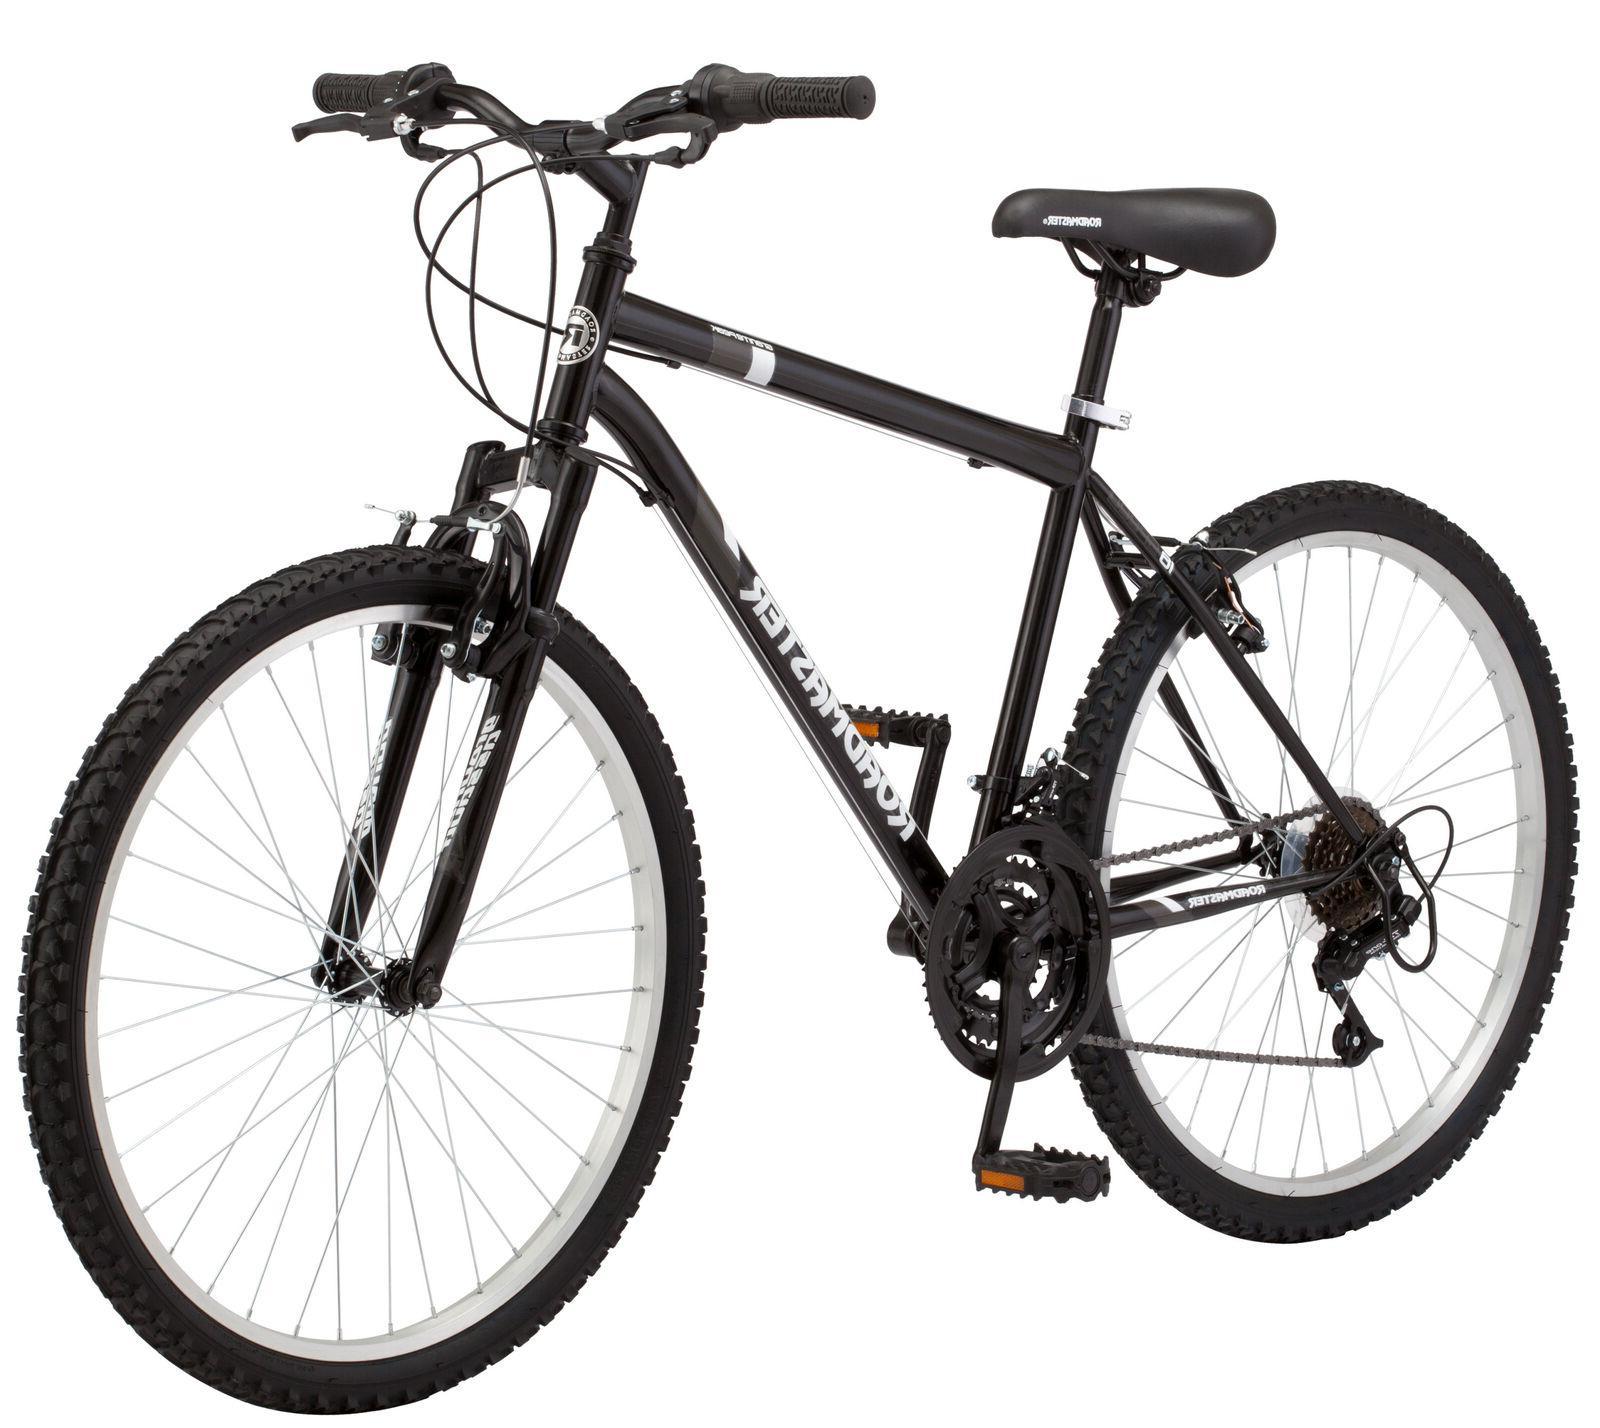 Roadmaster Granite Peak Men's Mountain Bike, 26-inch wheels,